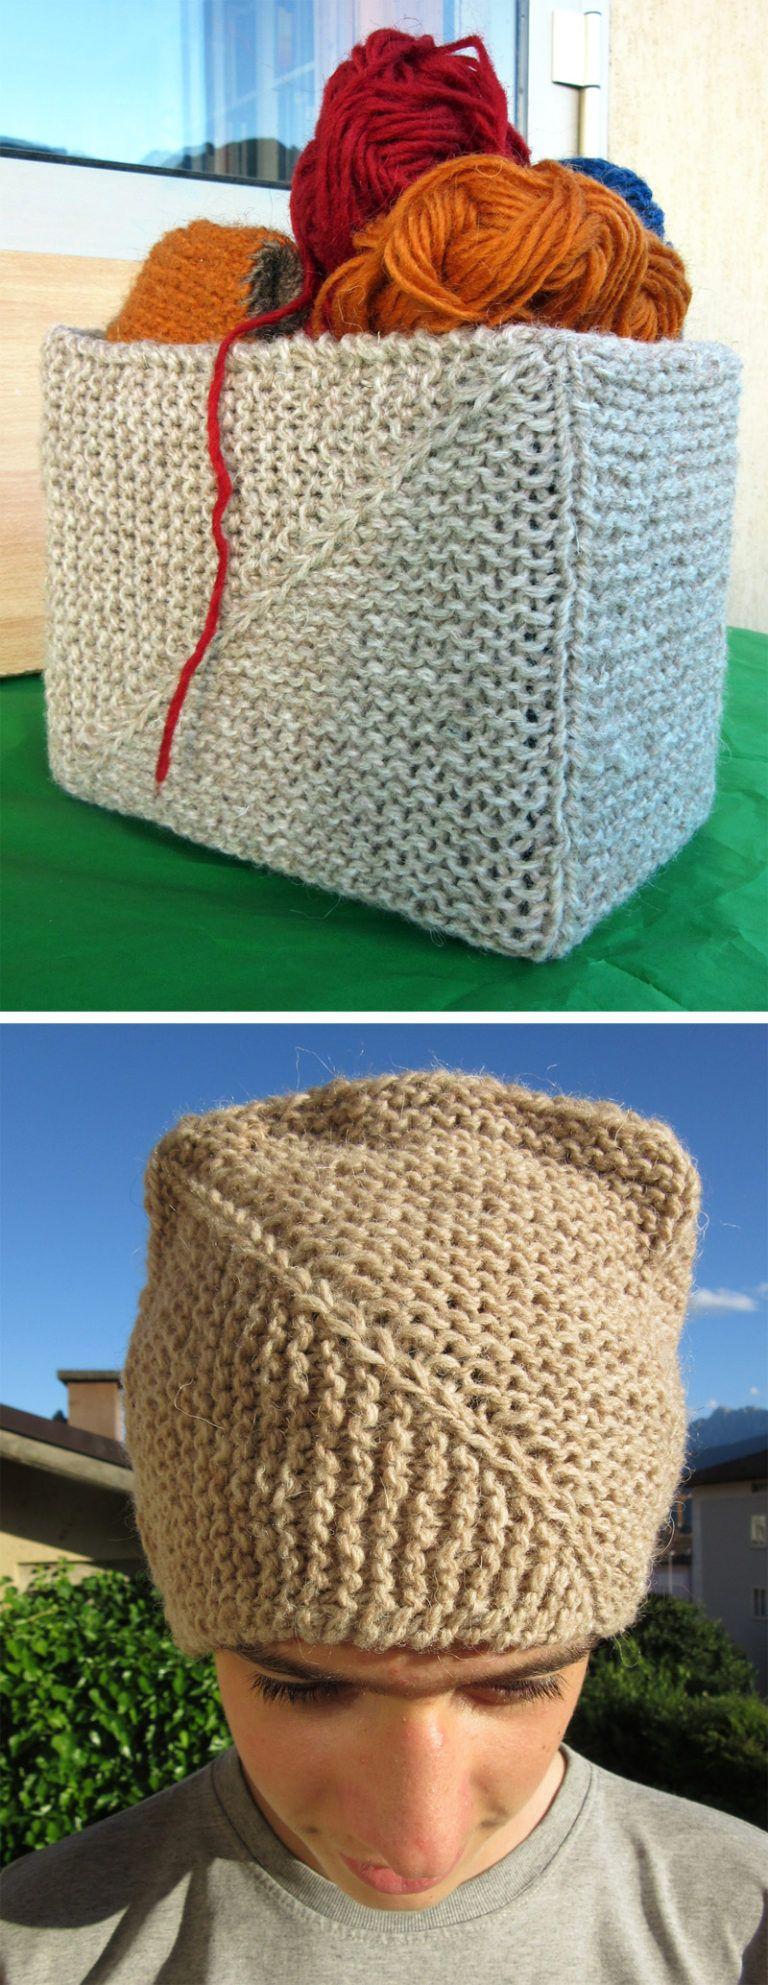 Multi Purpose Knitting Patterns In the Loop Knitting